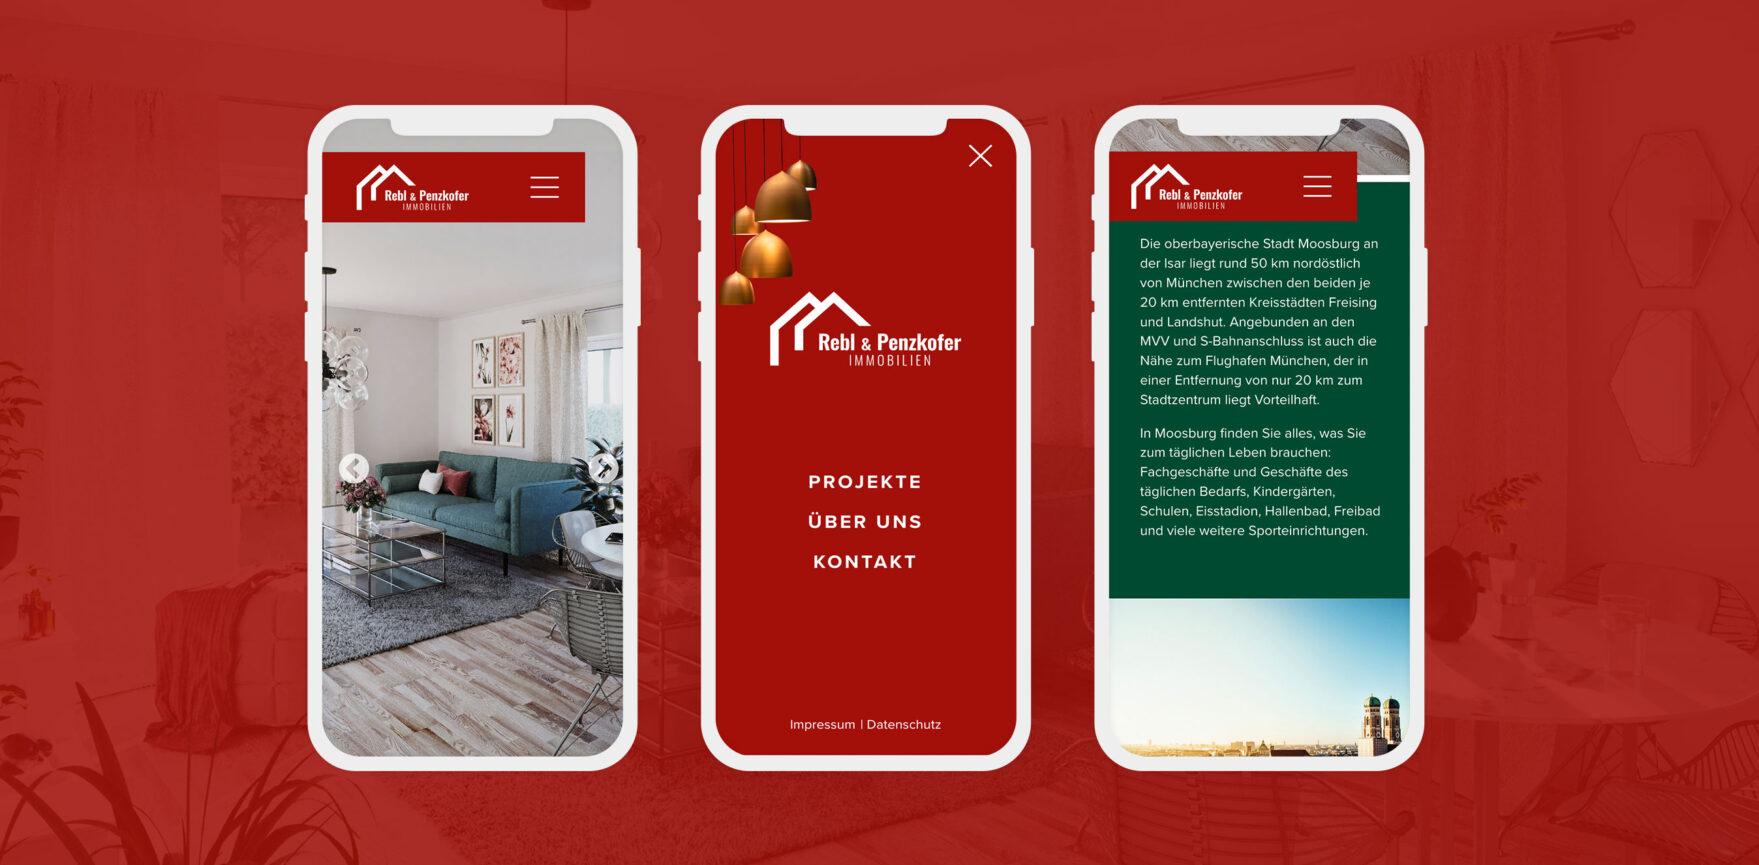 Rebl und Penzkofer Website Immobilien mobile Ansicht